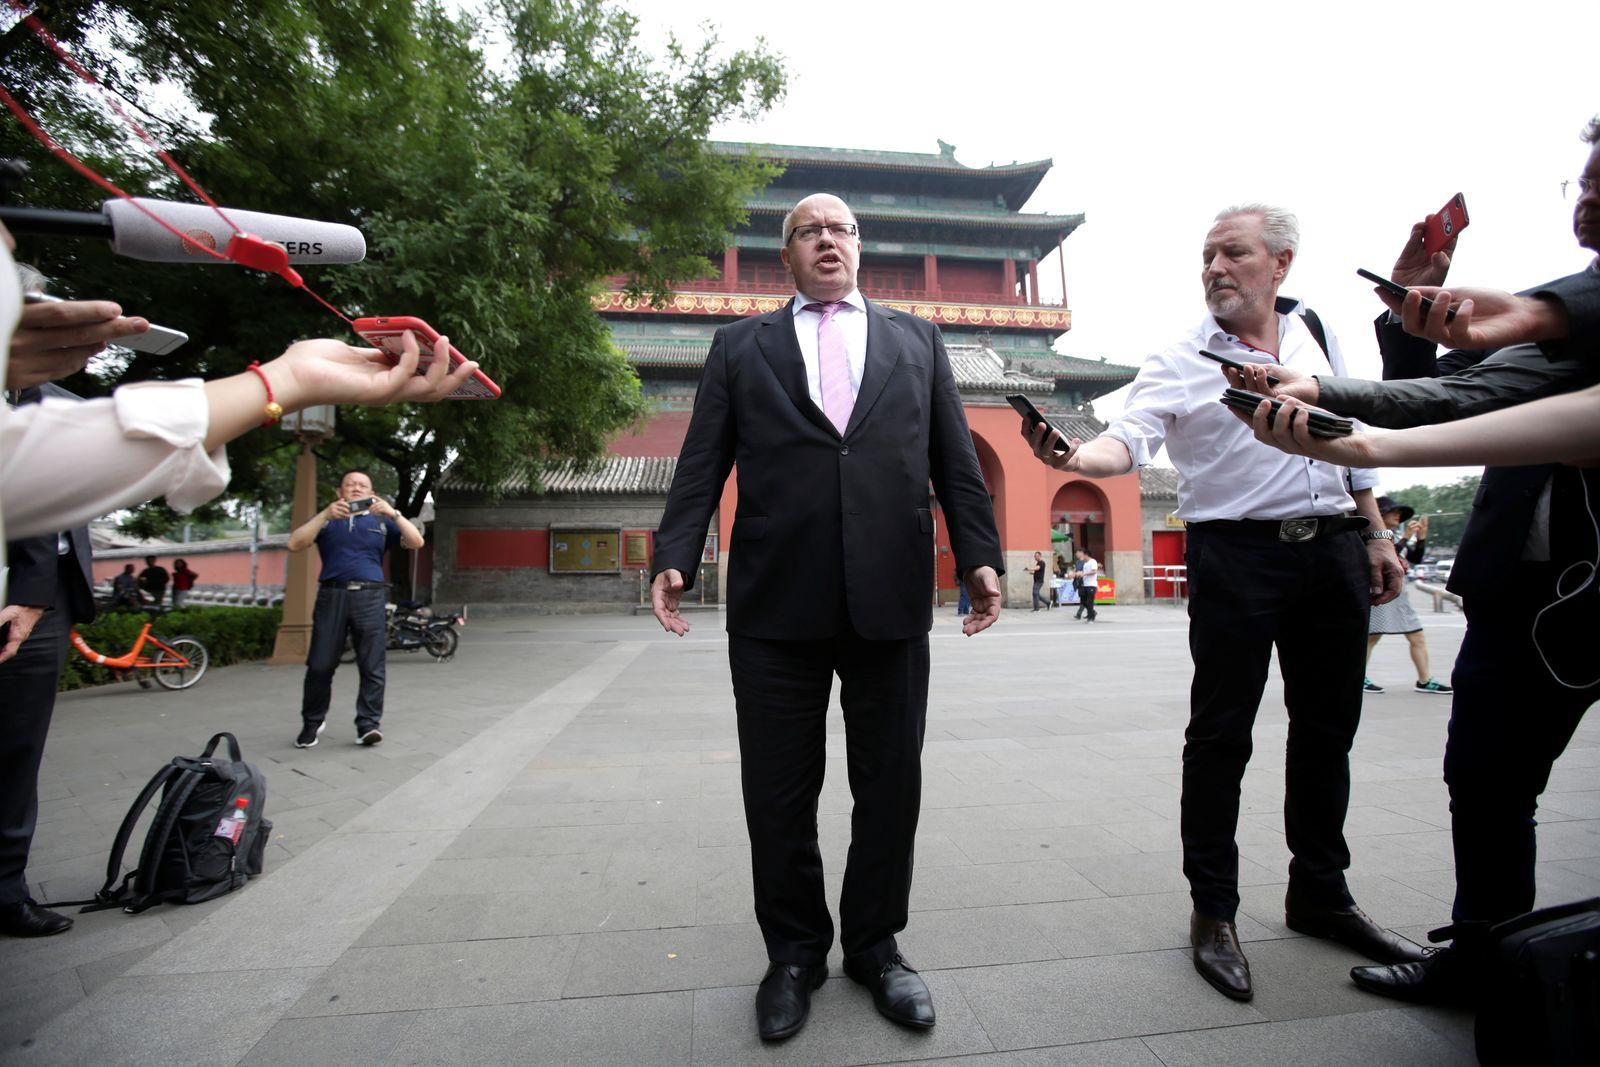 CHINA-GERMANY/ECONOMY